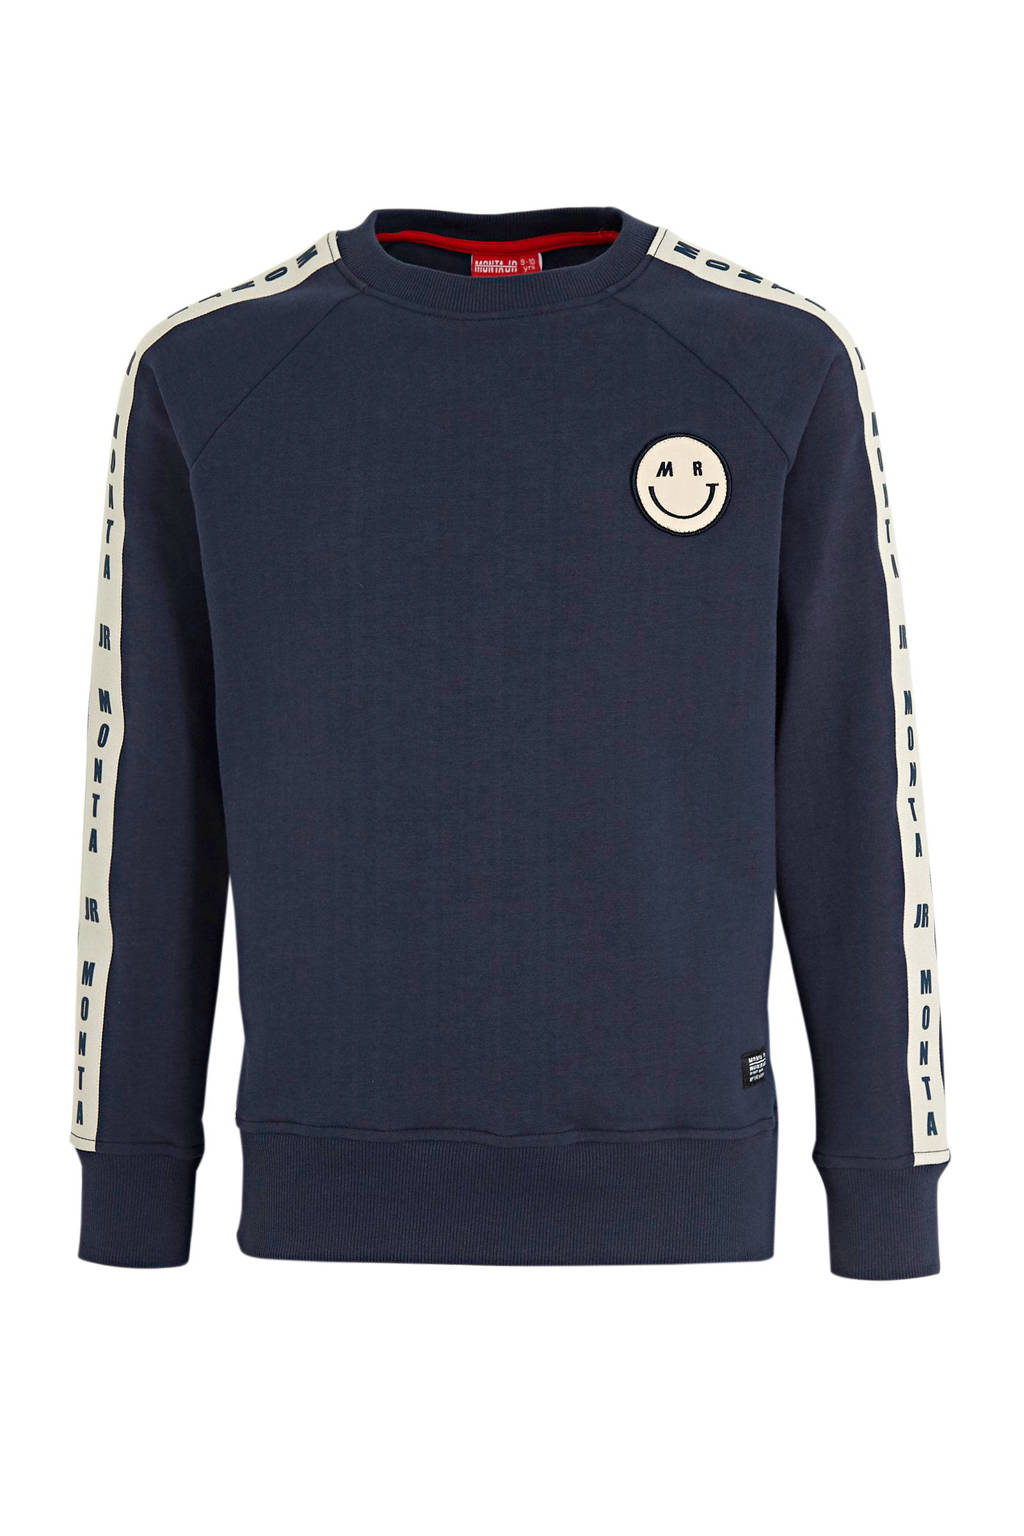 Monta sweater Charlie met printopdruk donkerblauw/wit, Donkerblauw/wit